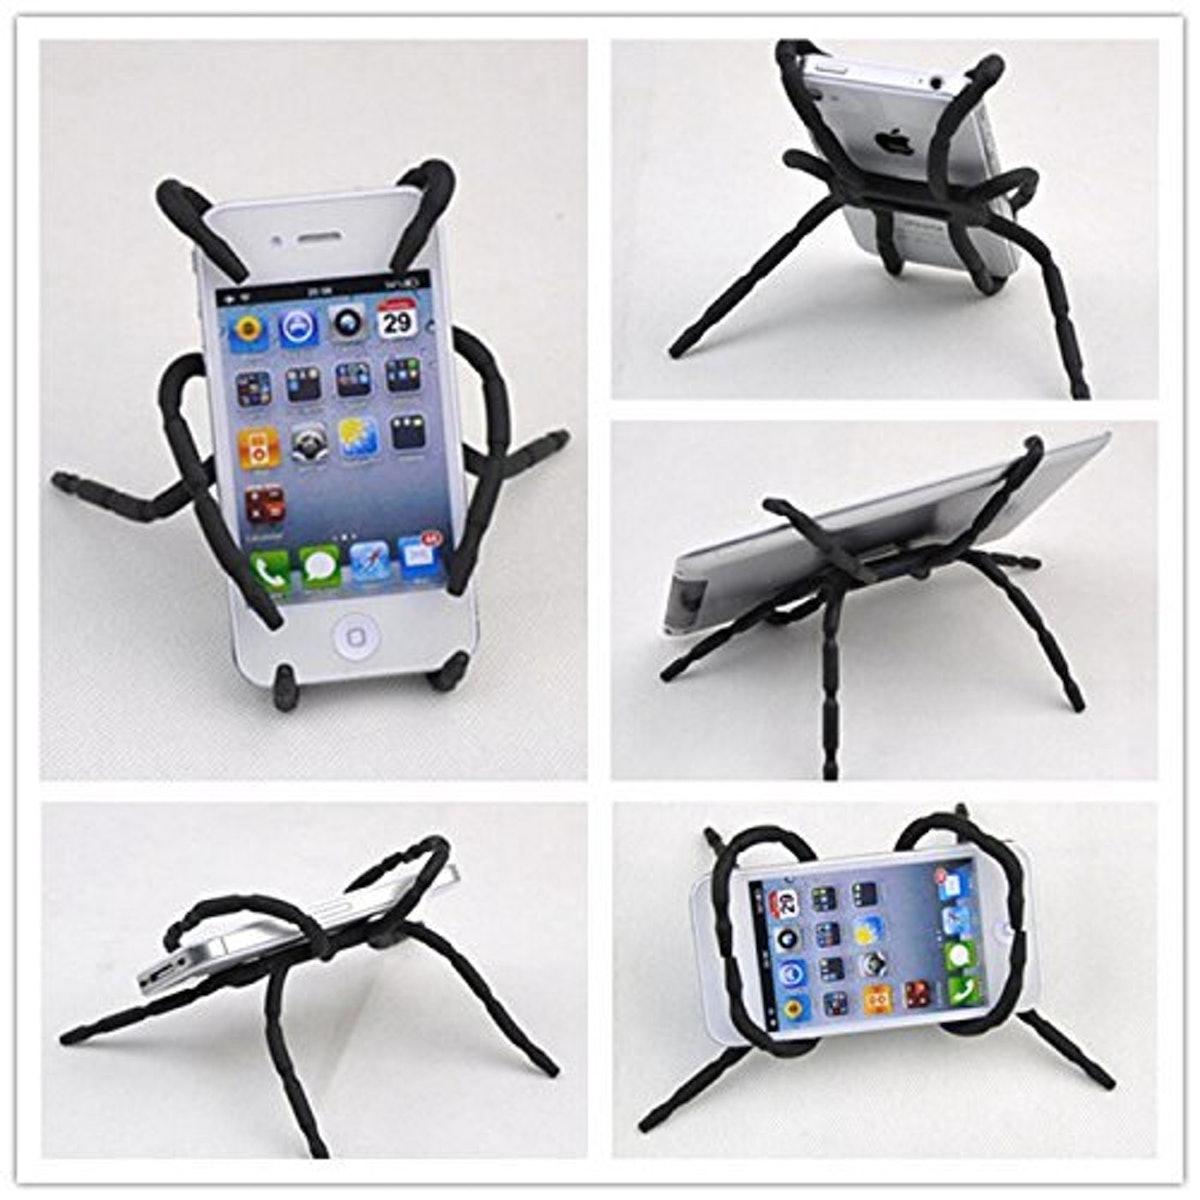 Rienar Multi-Function Spider Phone Holder